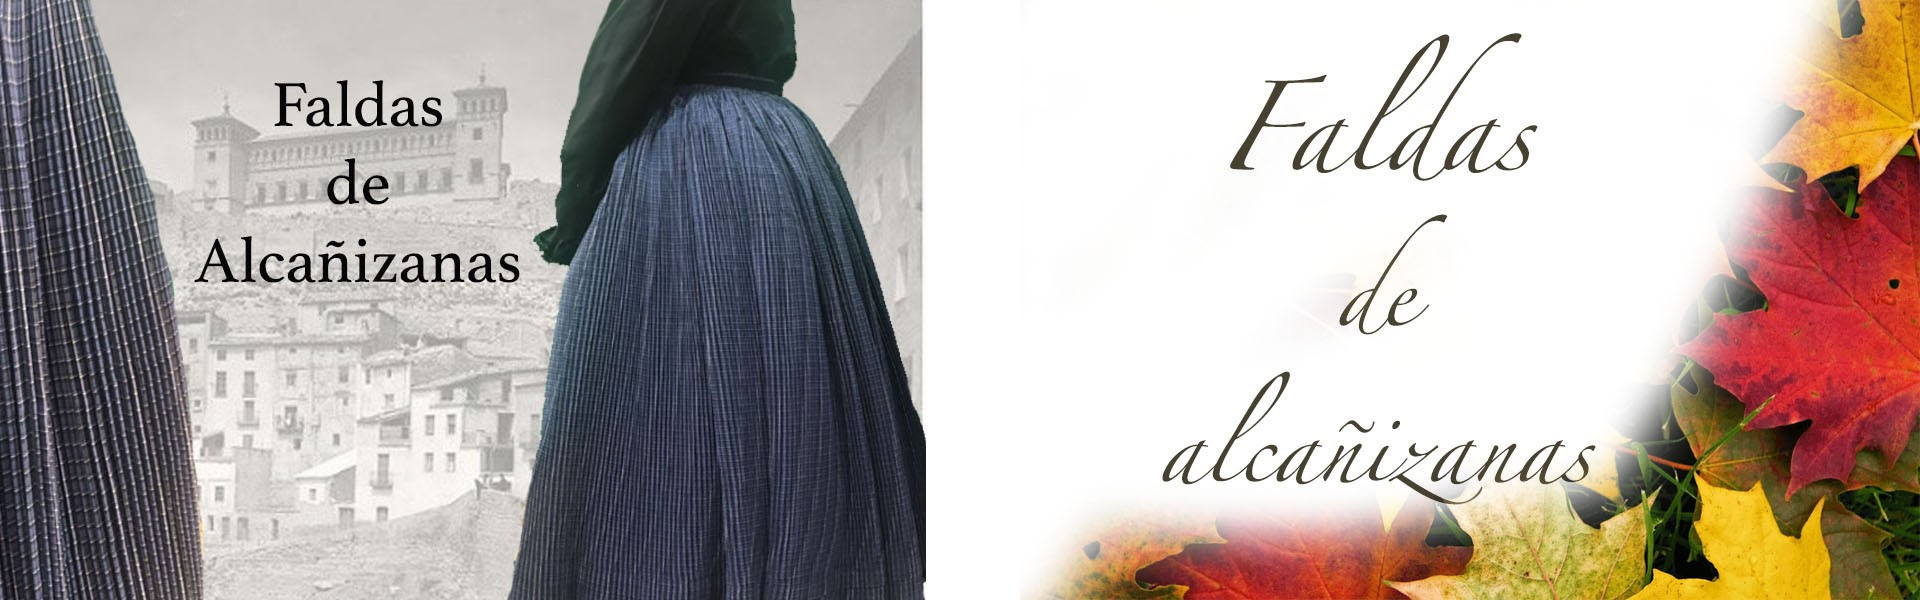 Faldas de alcañizanas